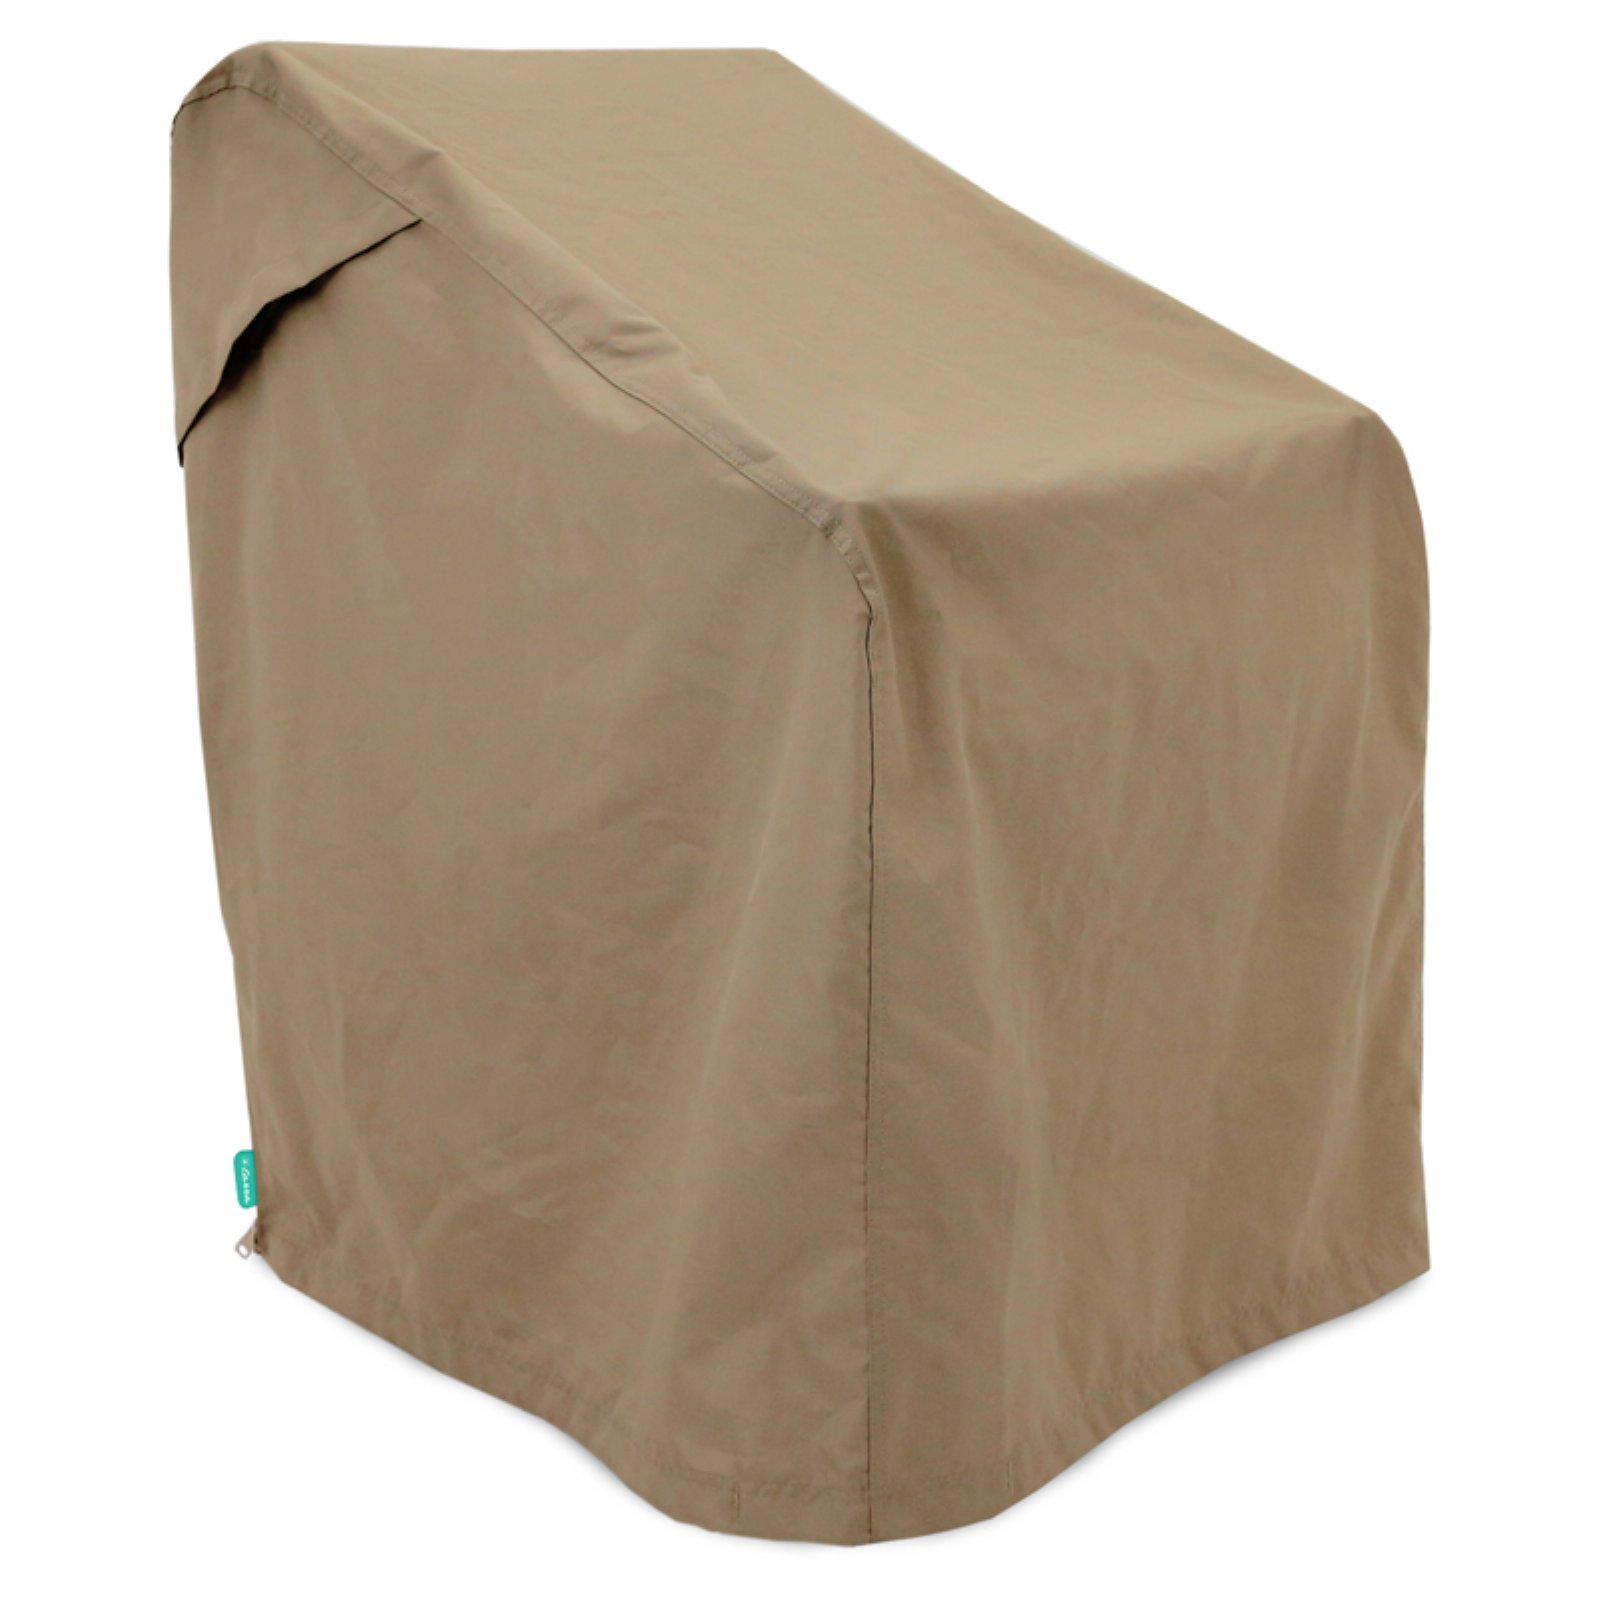 Tarra Home Universal Outdoor UFCCP302637PT Patio Chair Cover